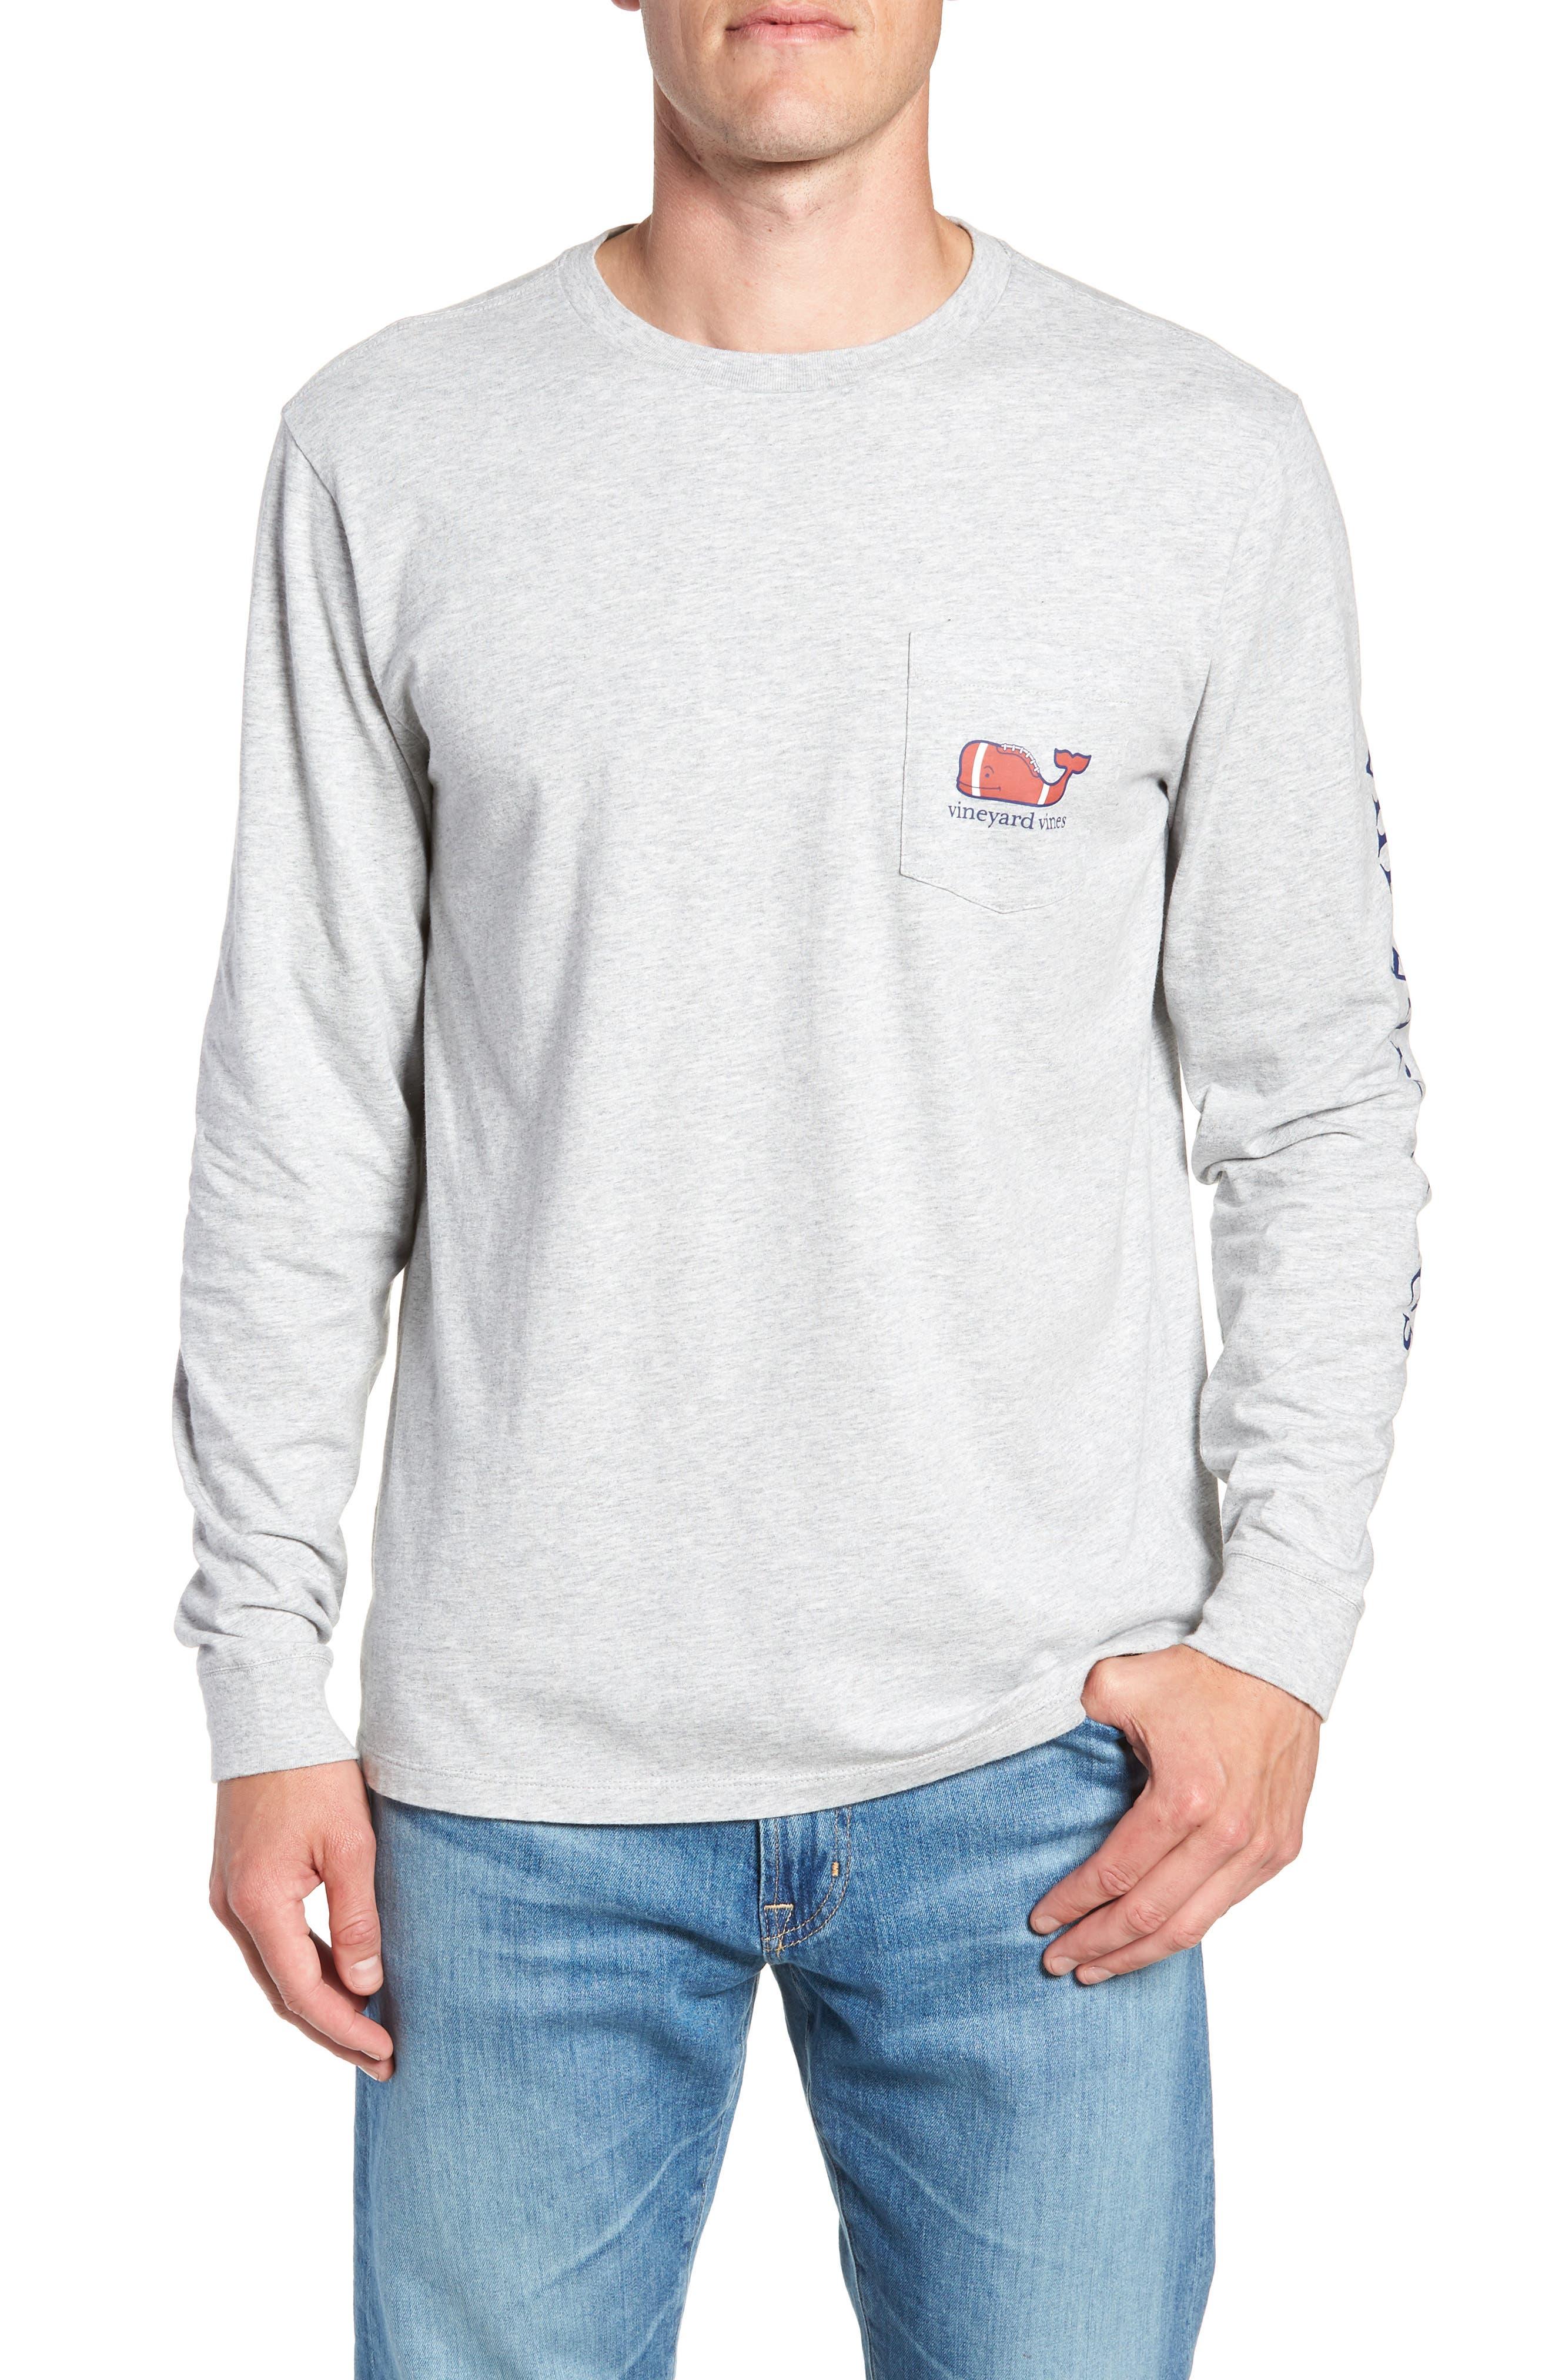 Football Whale Long Sleeve Pocket T-Shirt,                         Main,                         color, GRAY HEATHER